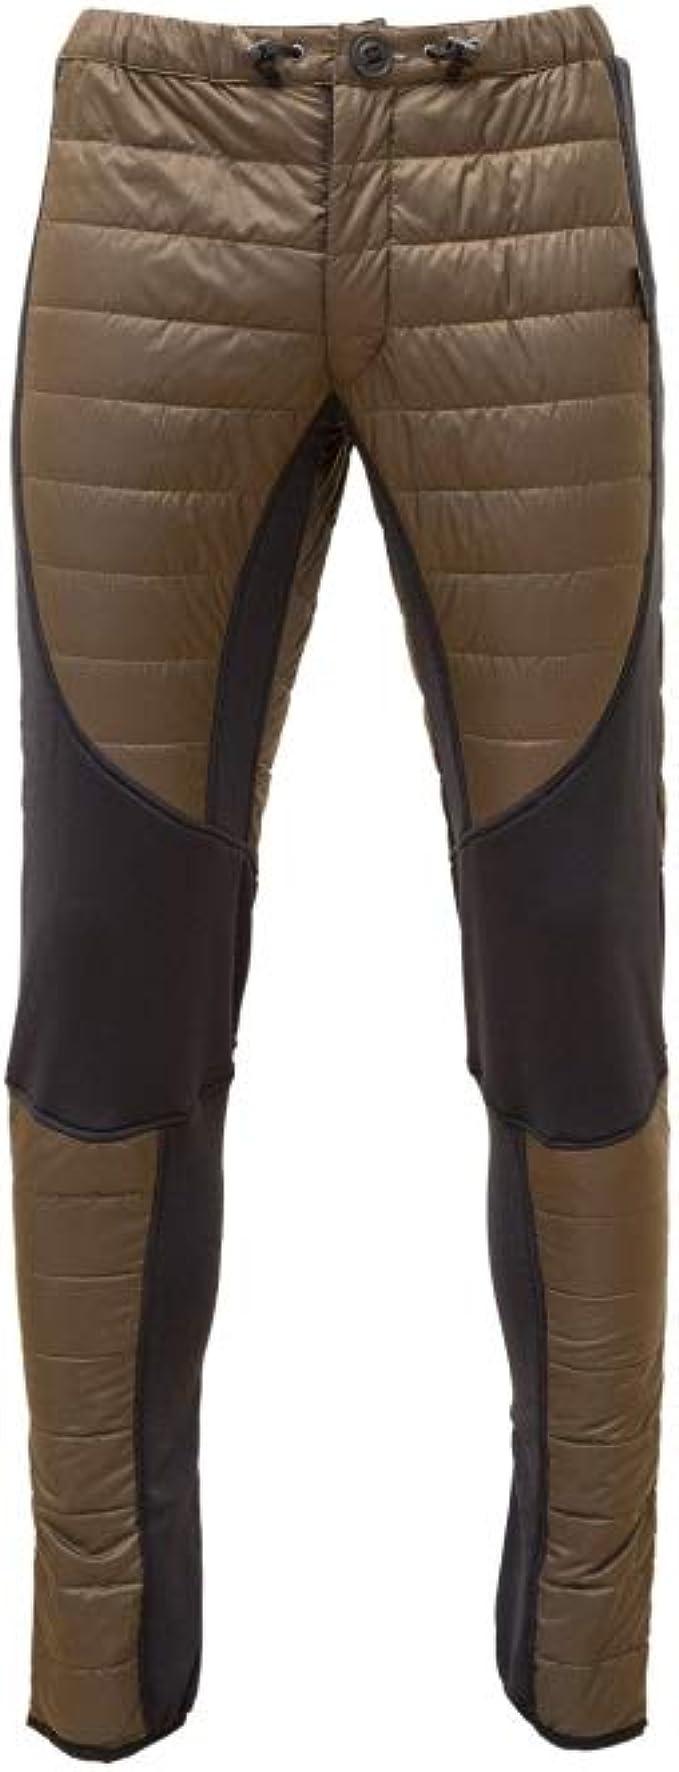 Carinthia G-Loft Ultra Pantalon Olive 2020